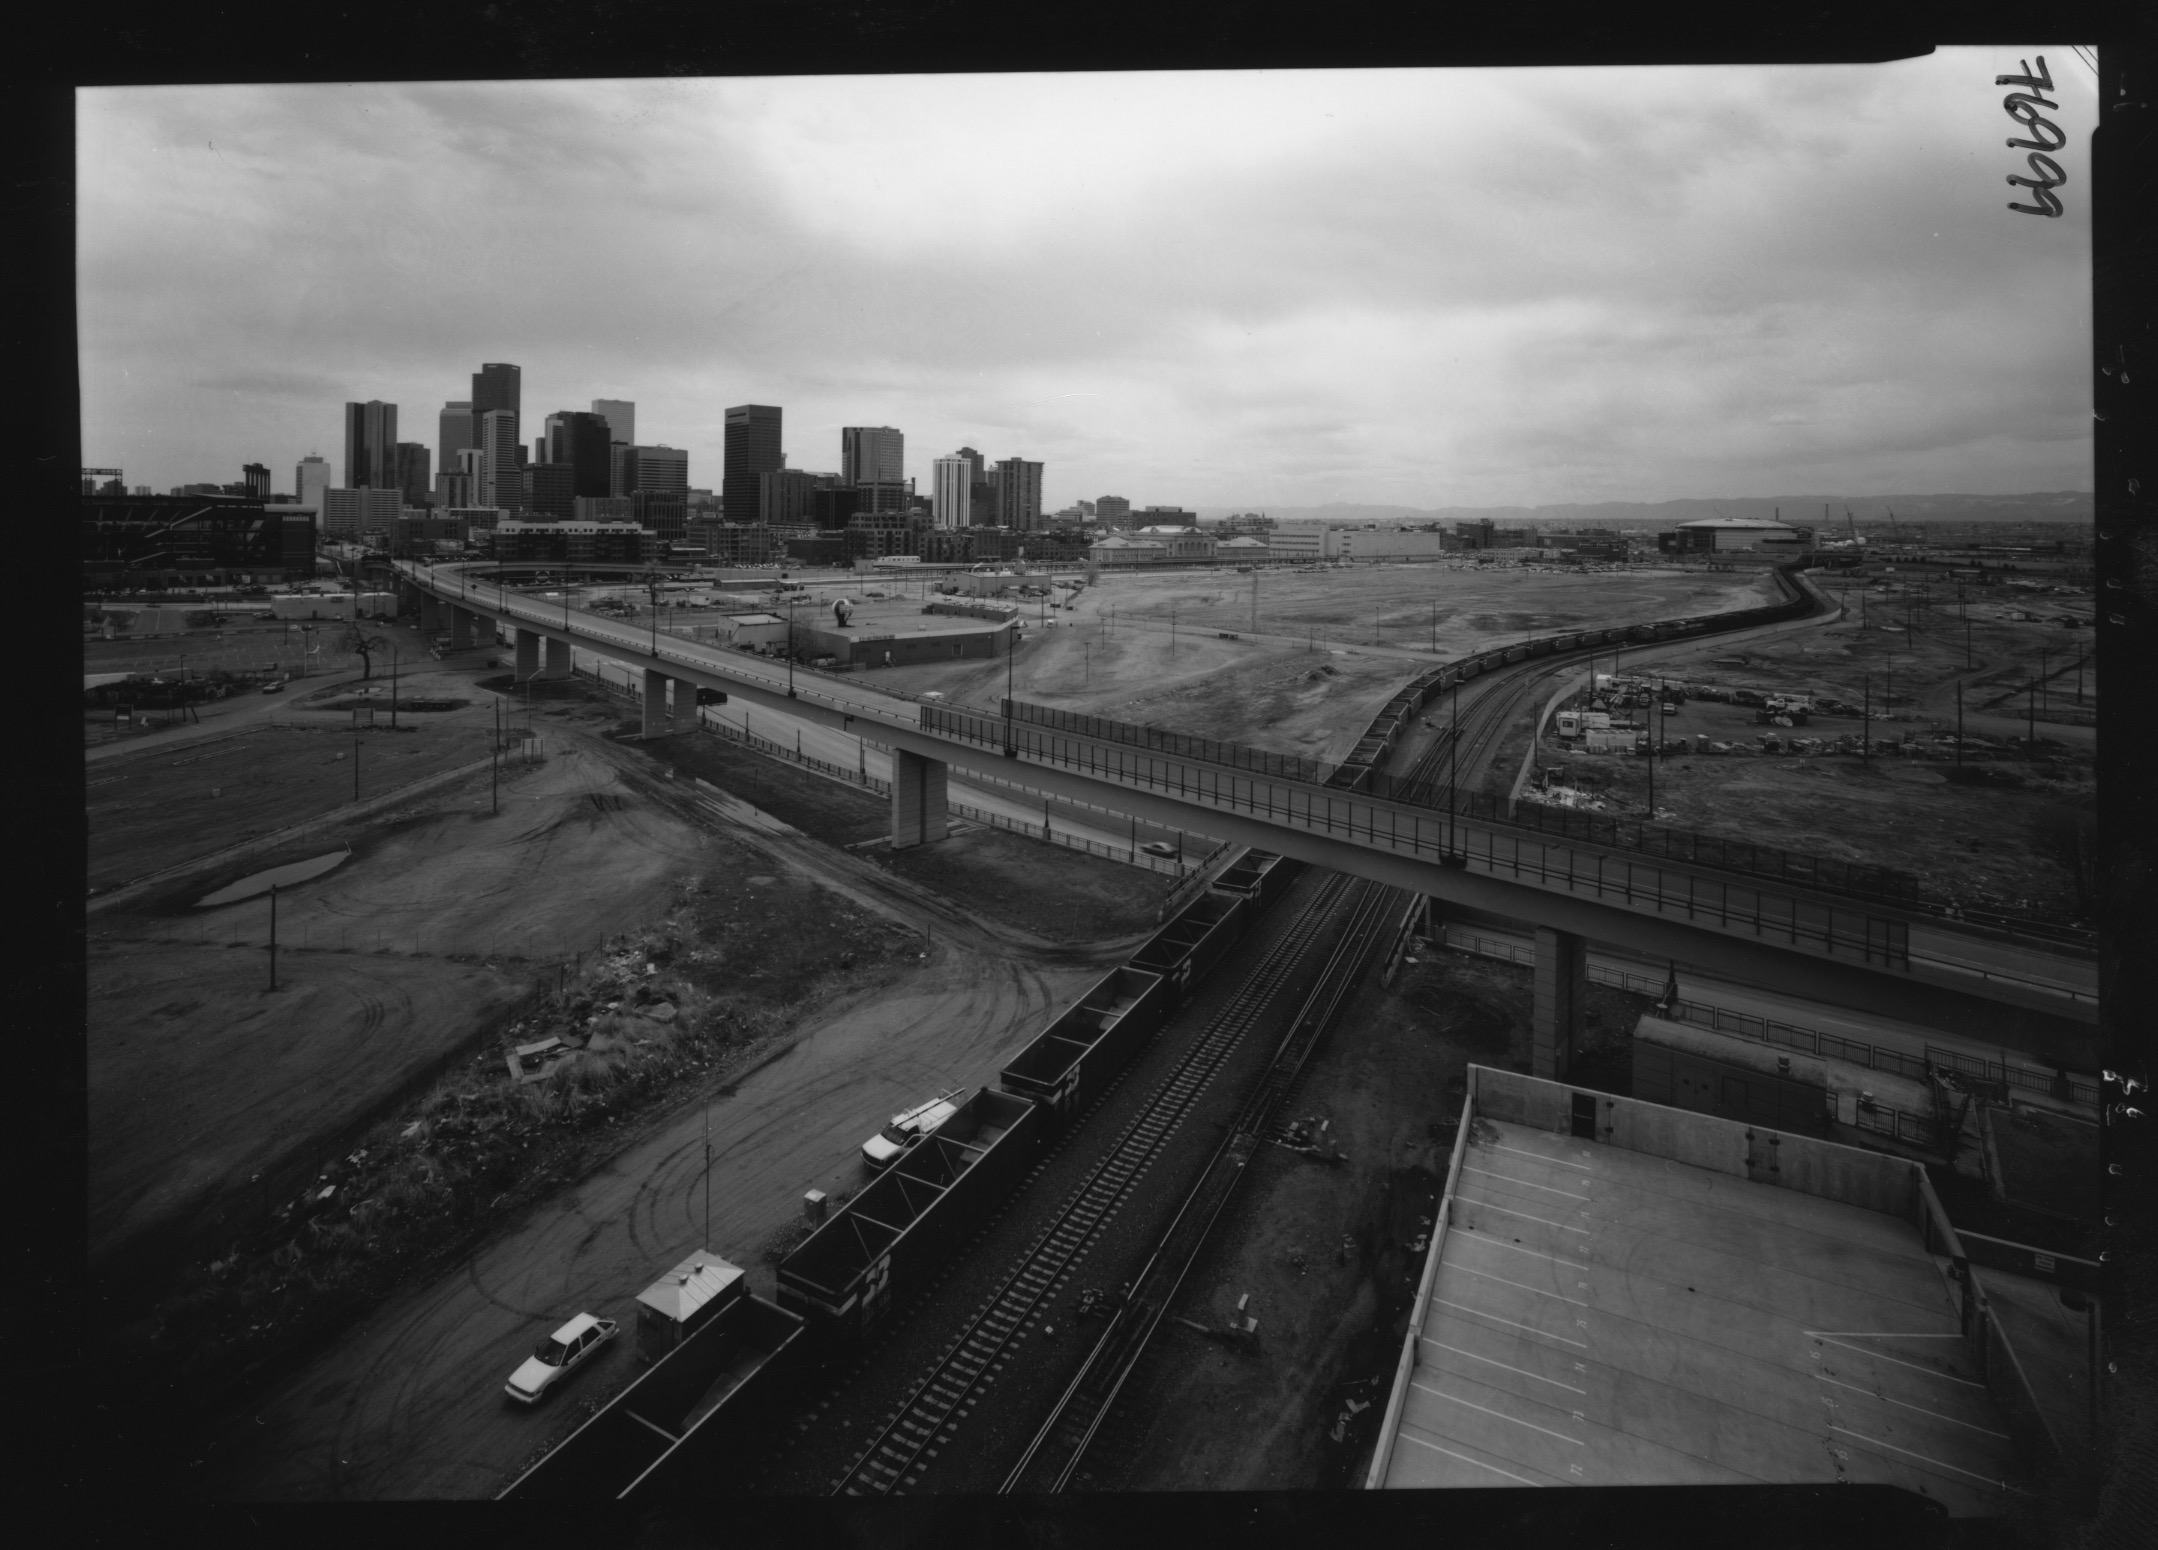 April 20, 1999 Platte River Valley